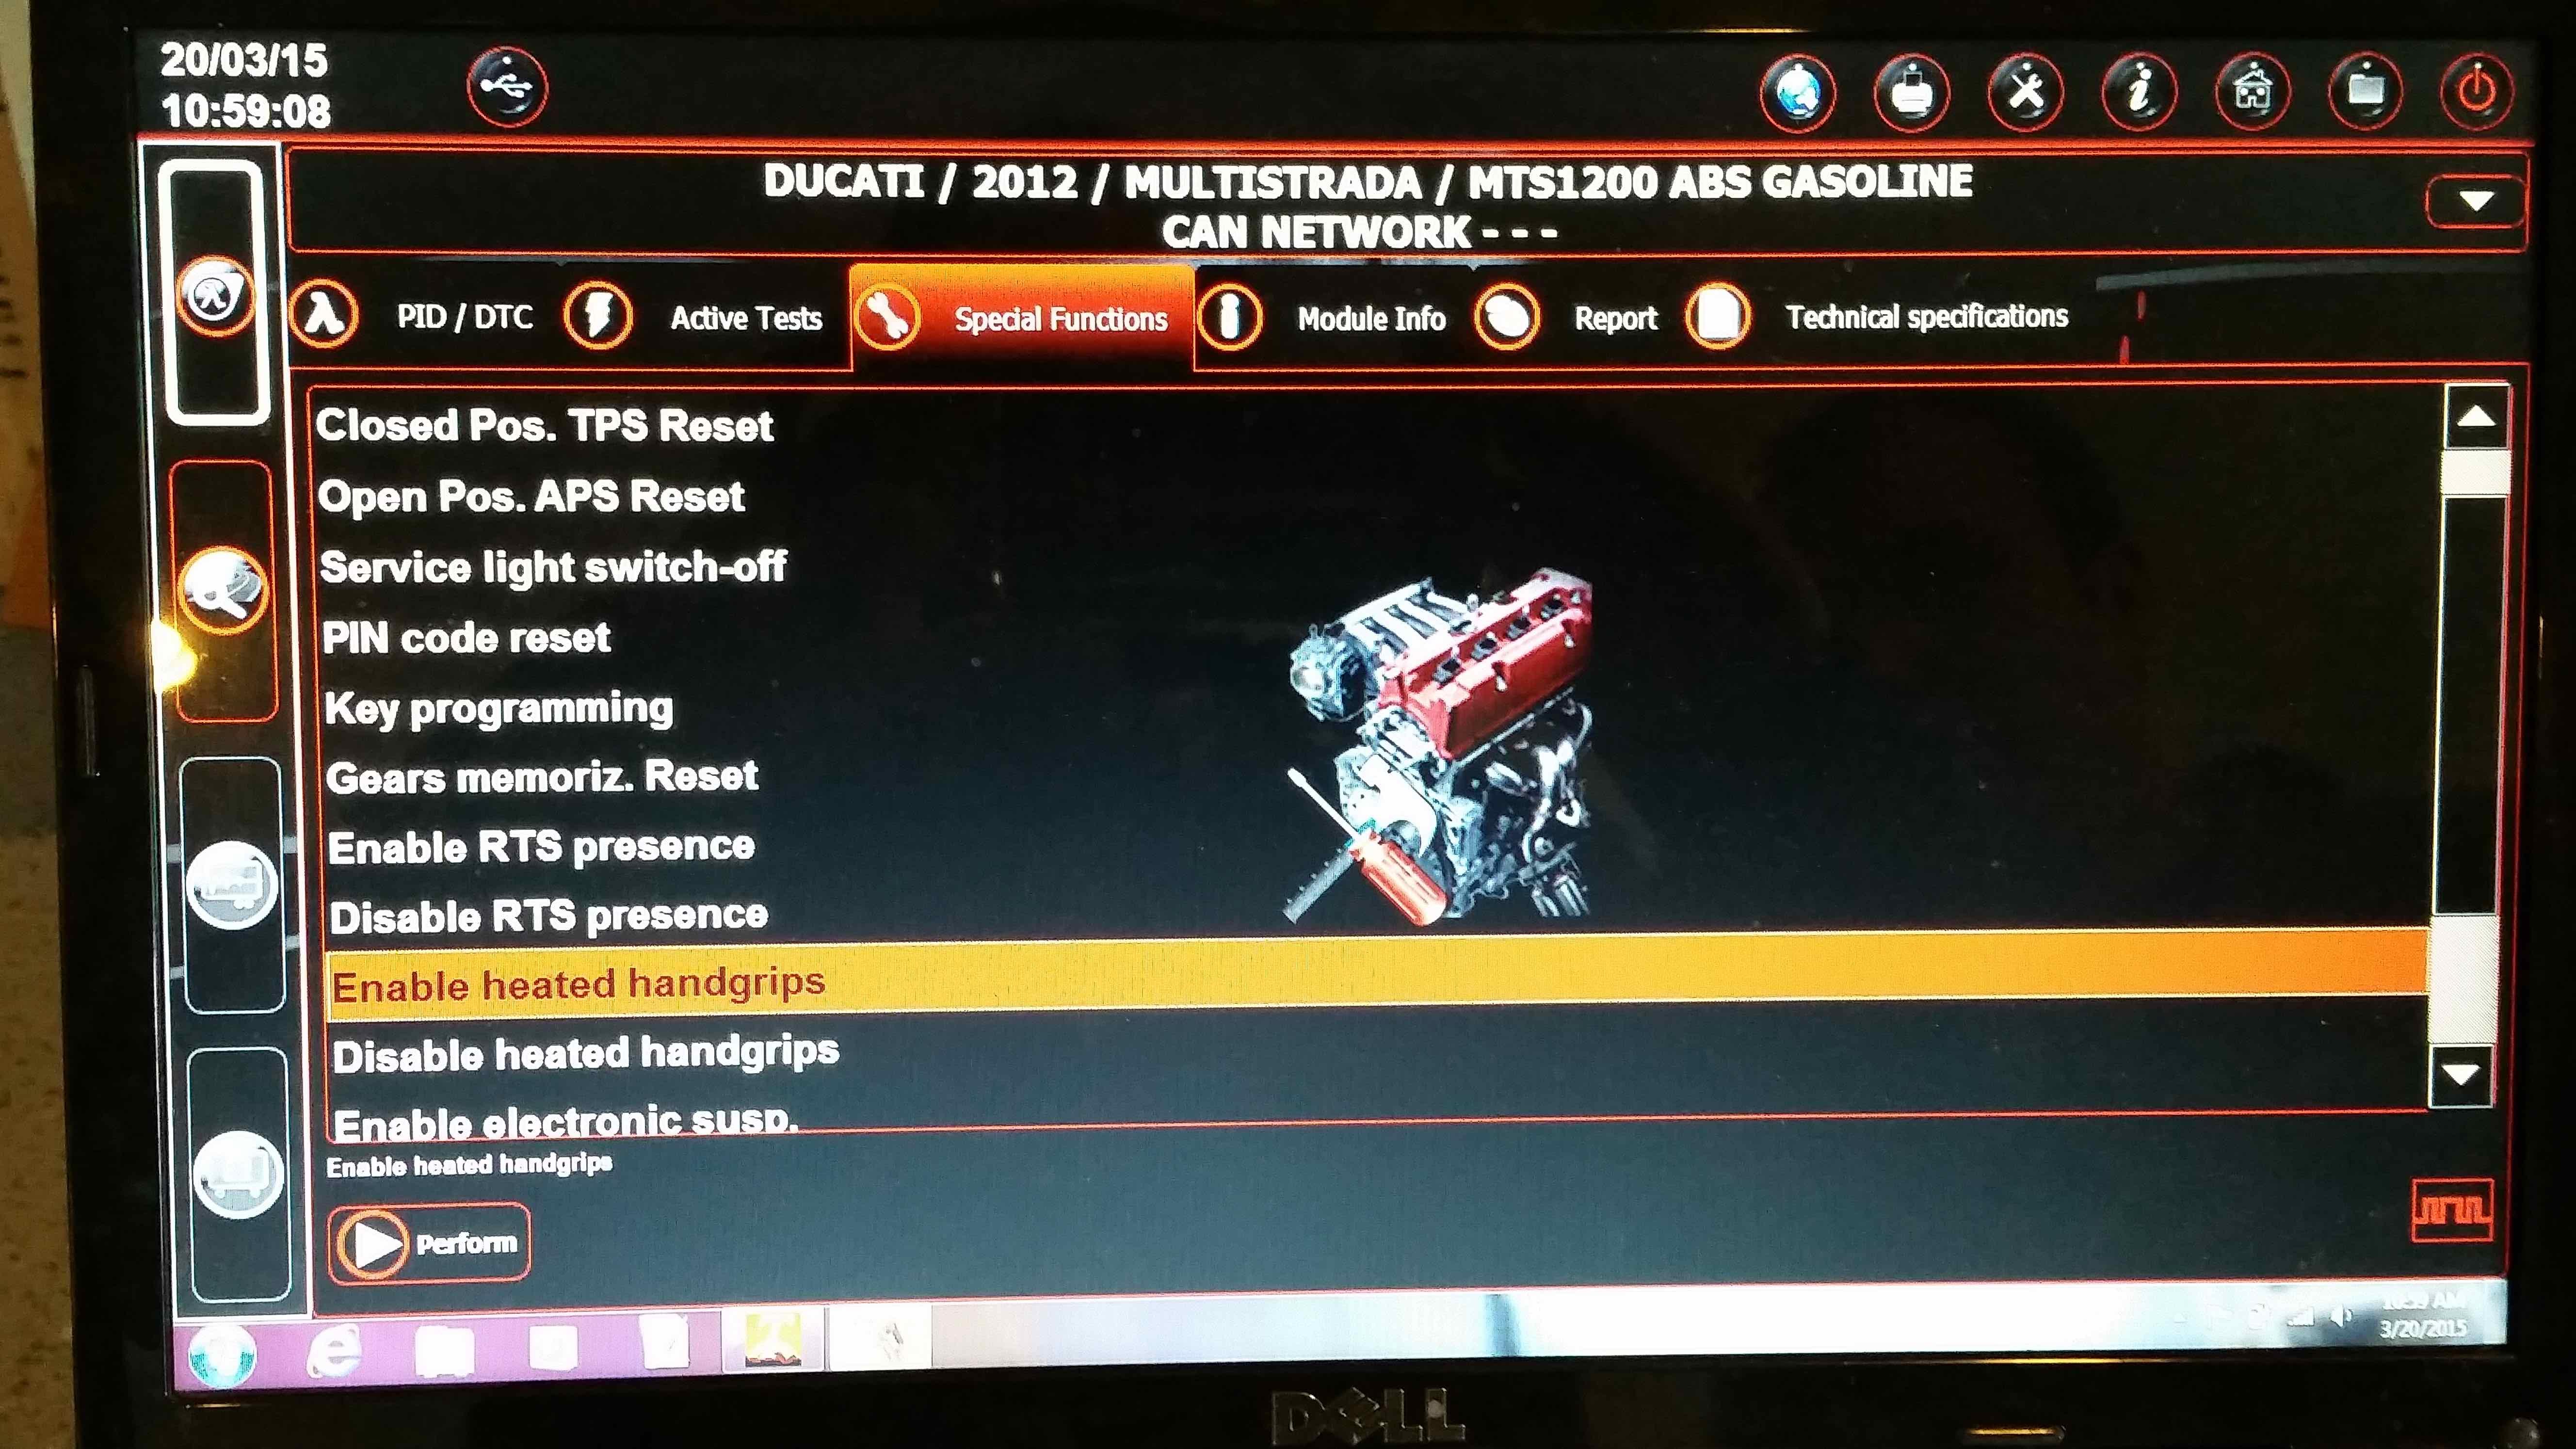 MTS 2012 heated grips - Ducati ms - The Ultimate Ducati Forum